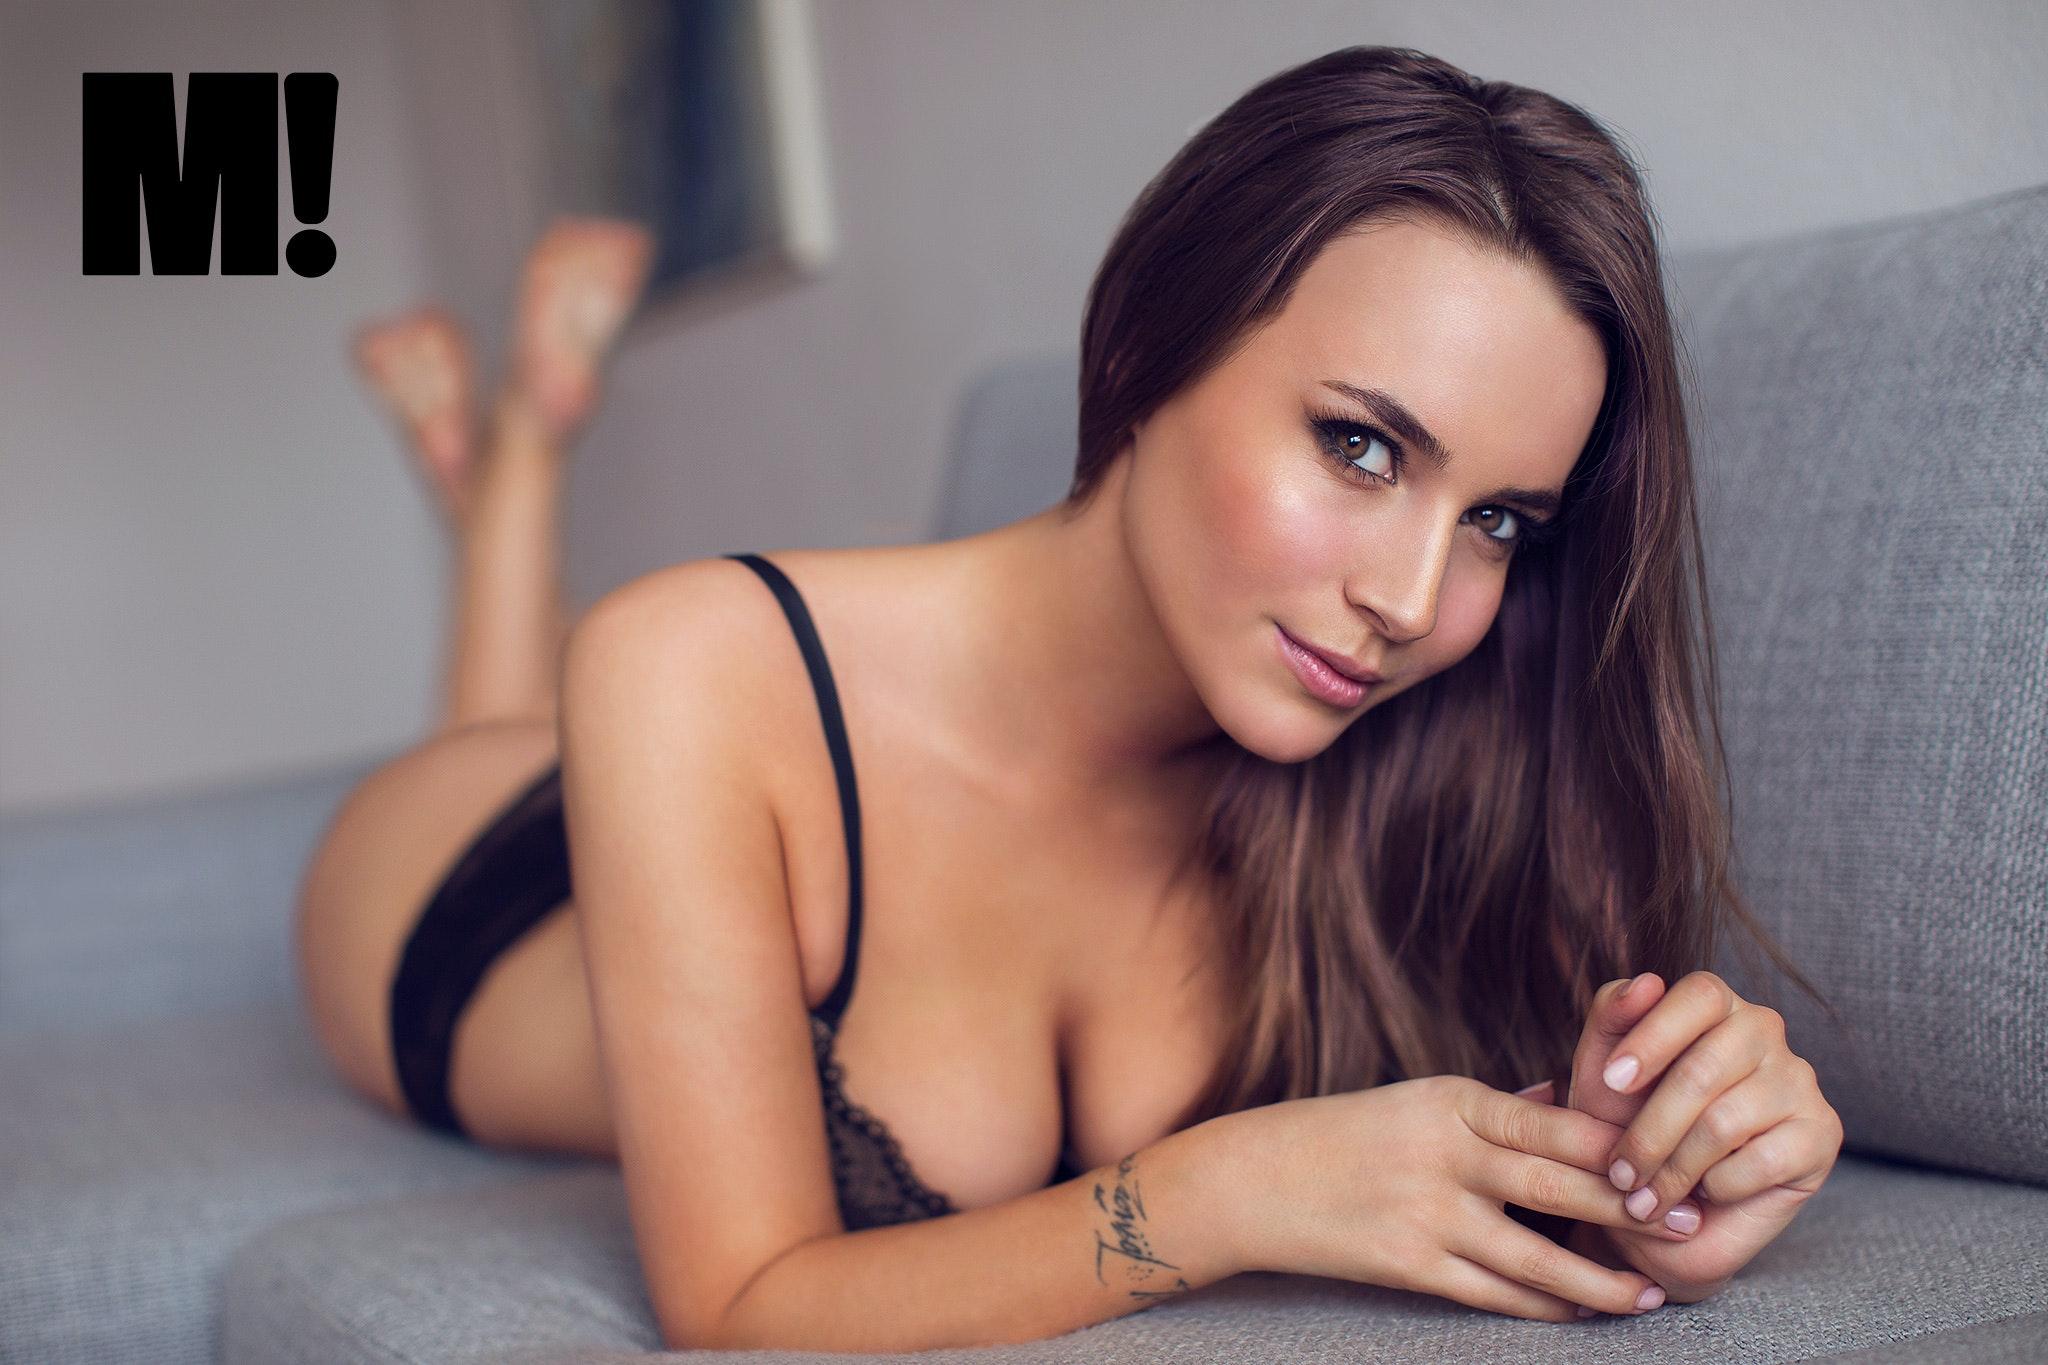 transvestite massage pornostjerne zilean